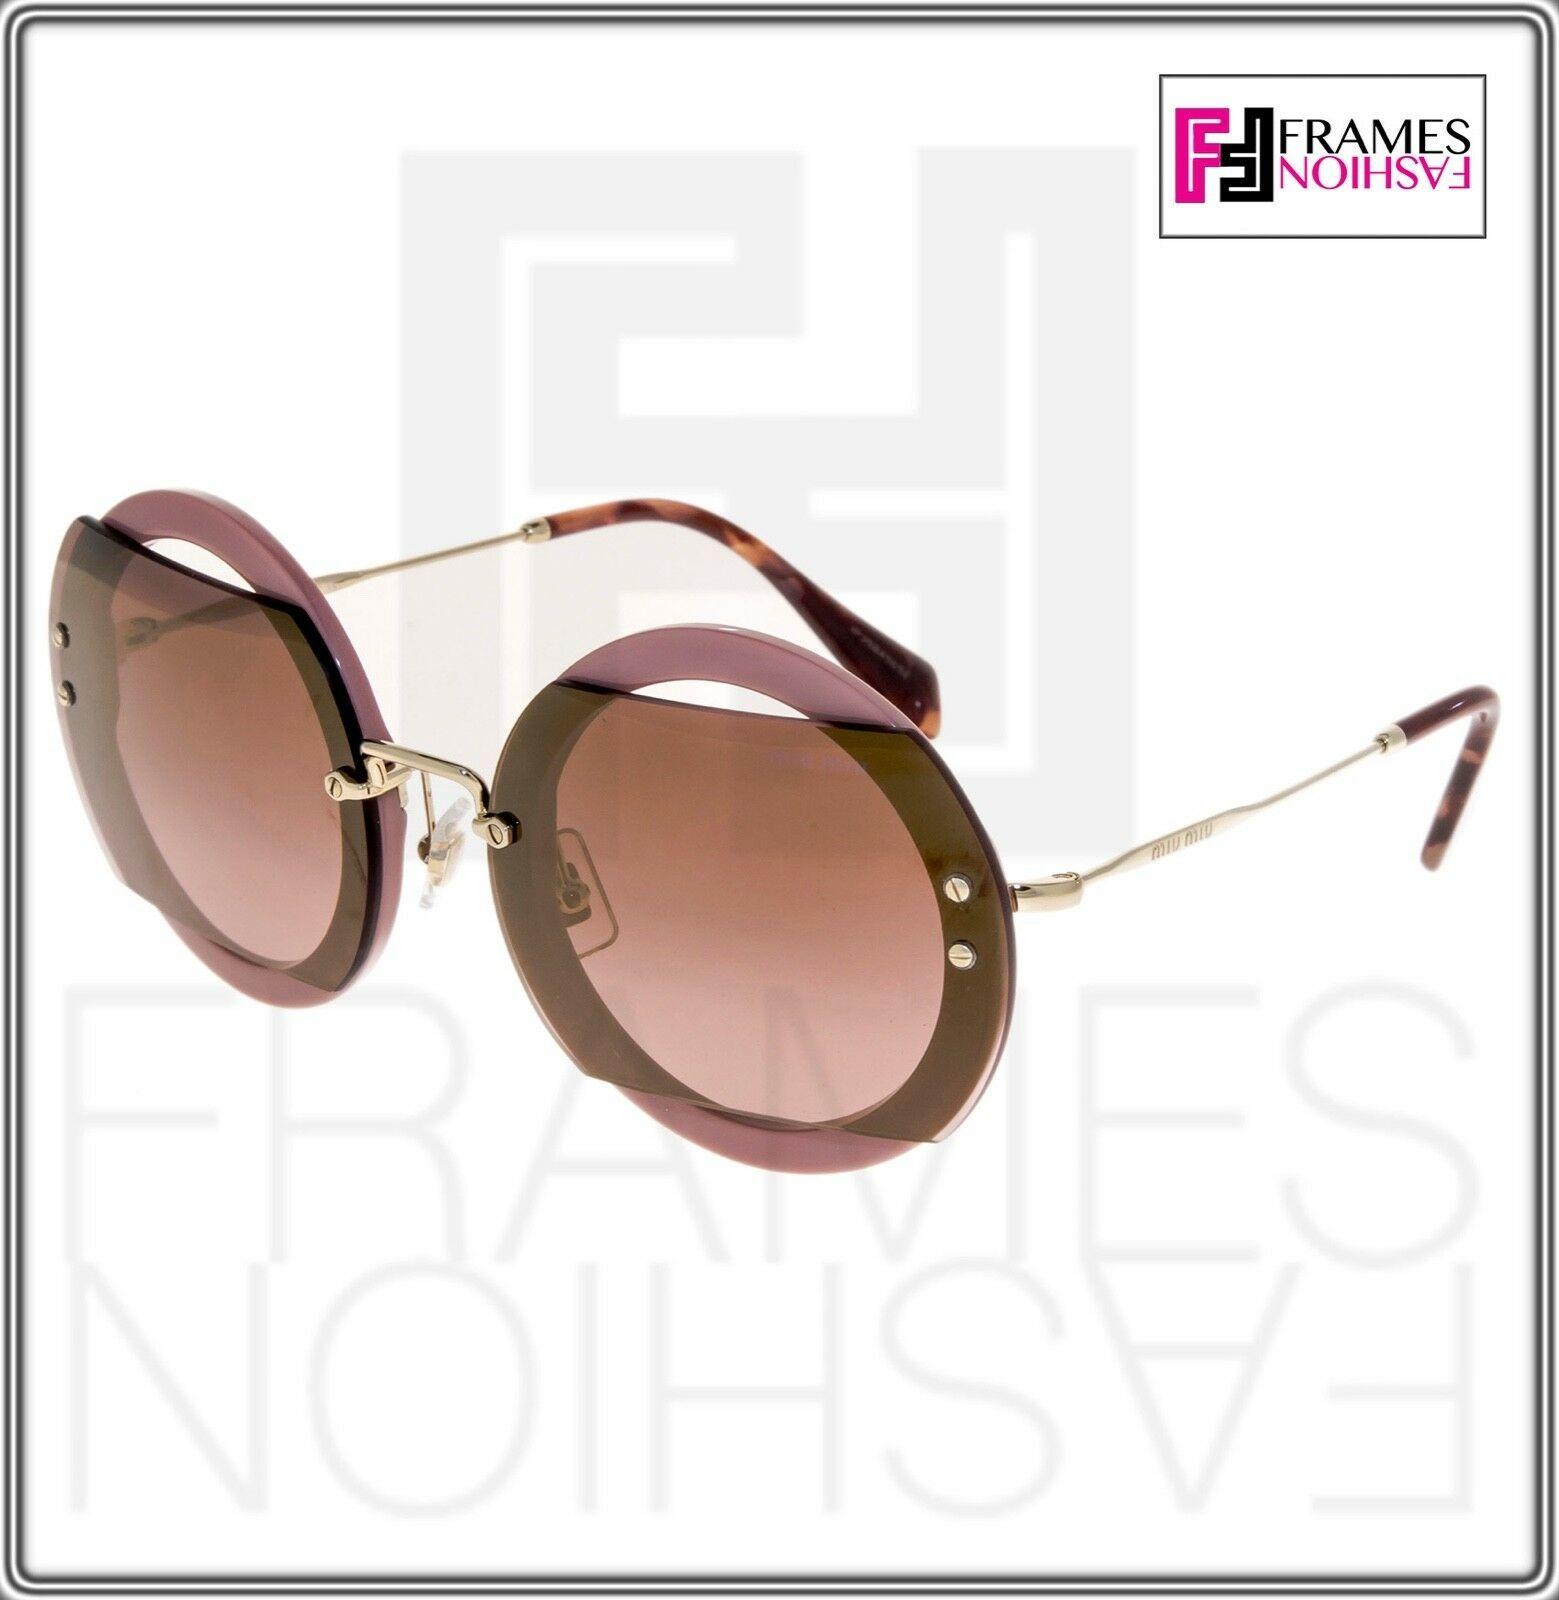 MIU MIU REVEAL 06S Gold Pink Burgundy Round Mirrored Sunglasses MU06SS Authentic